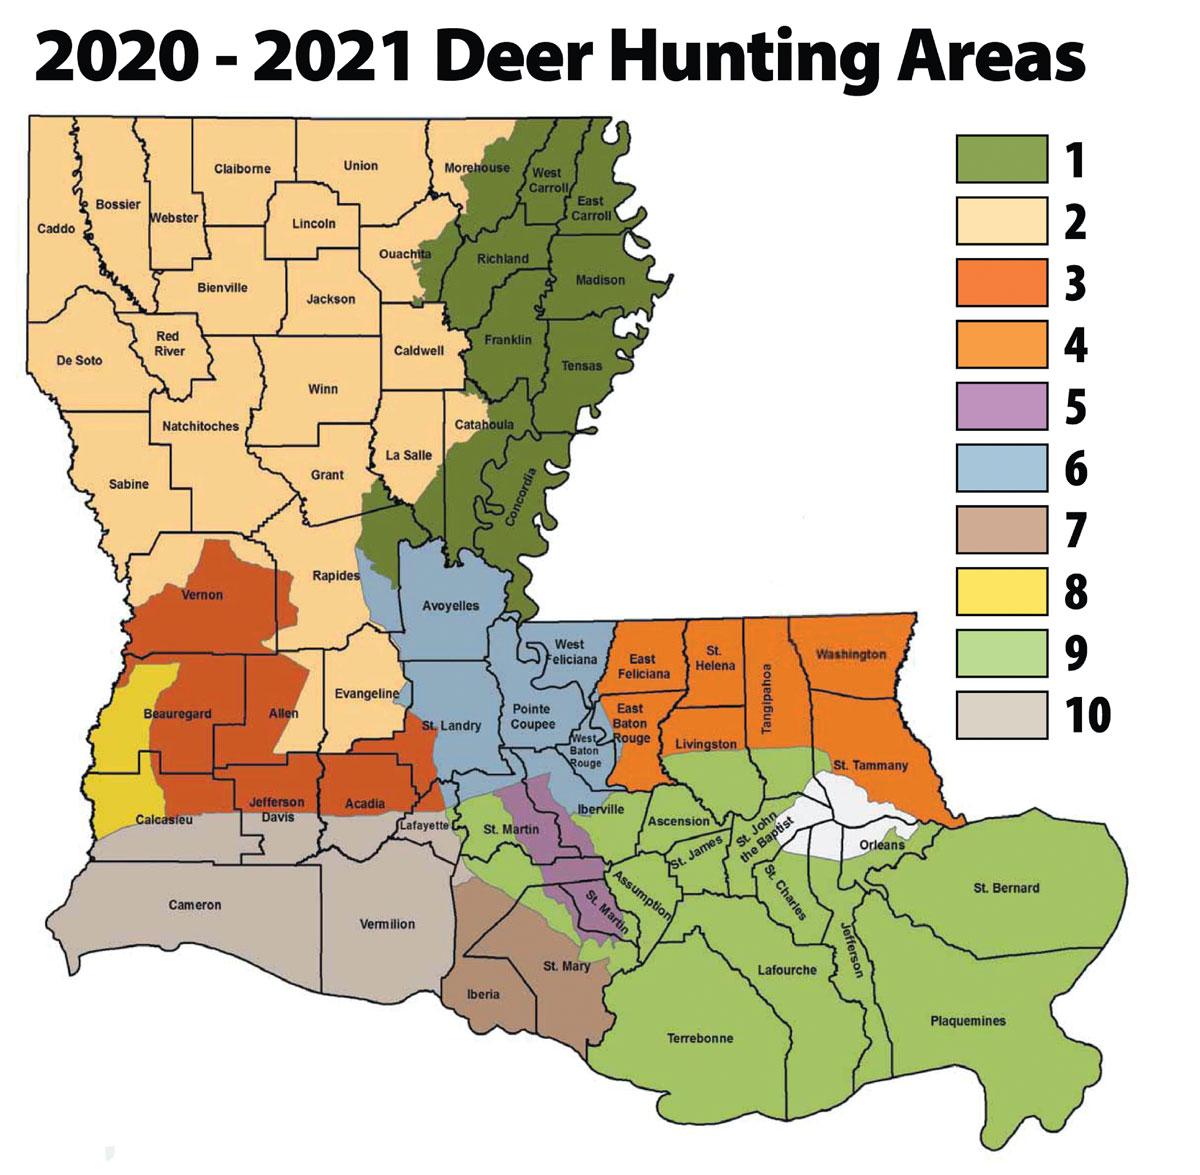 Louisiana'S 2020 Rut Report - Louisiana Sportsman intended for 2021 Deer Rut